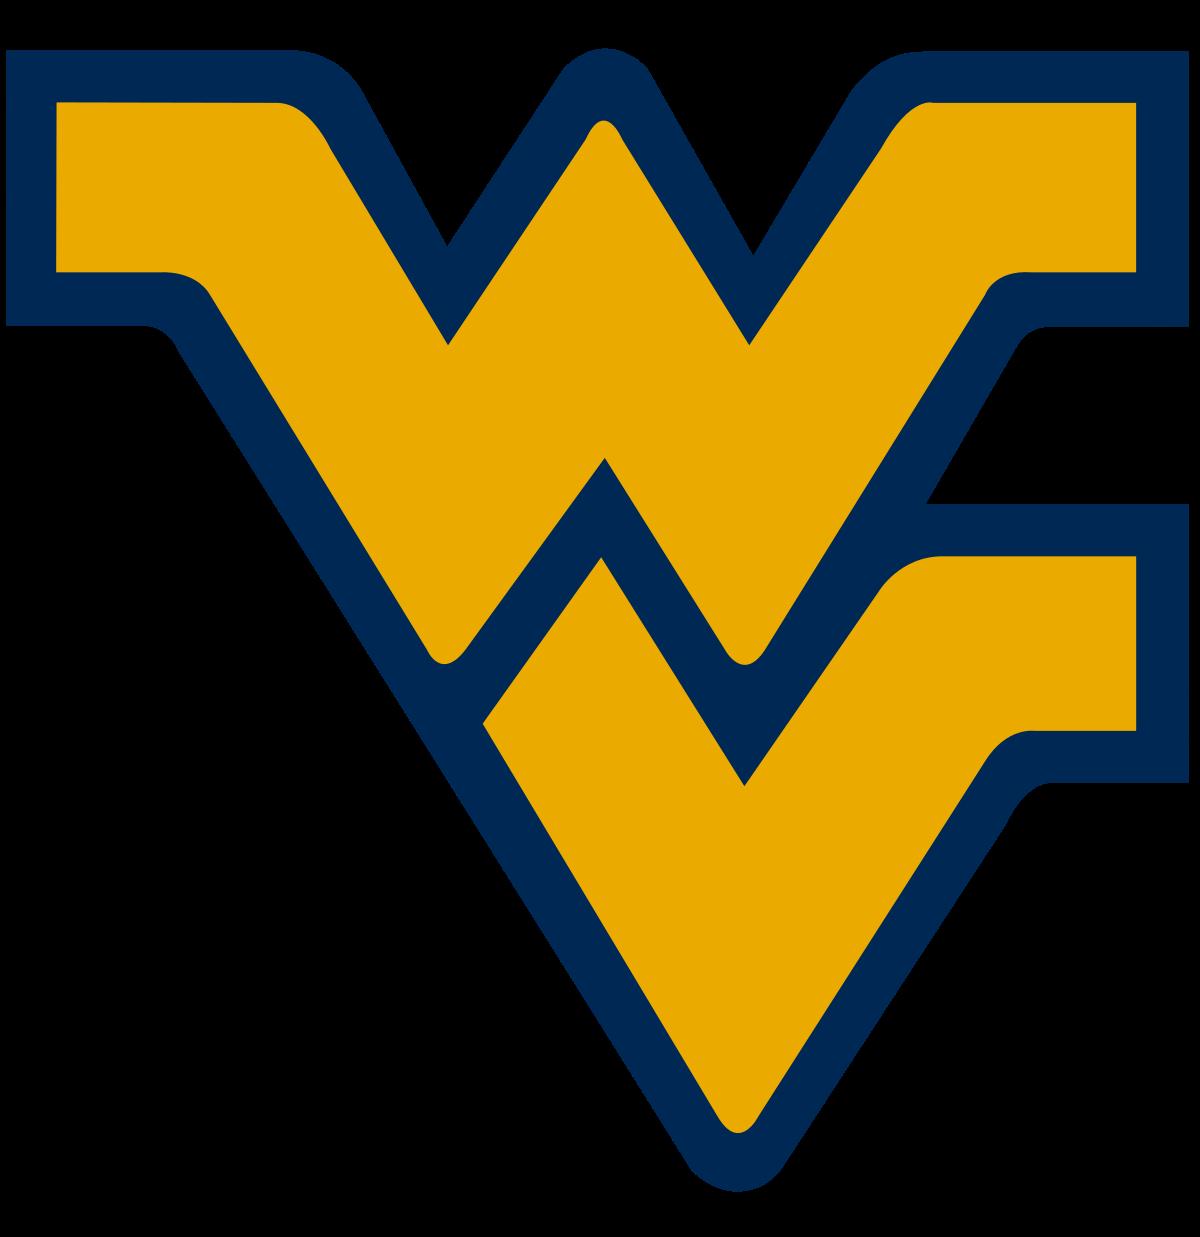 1962 West Virginia Mountaineers football team.